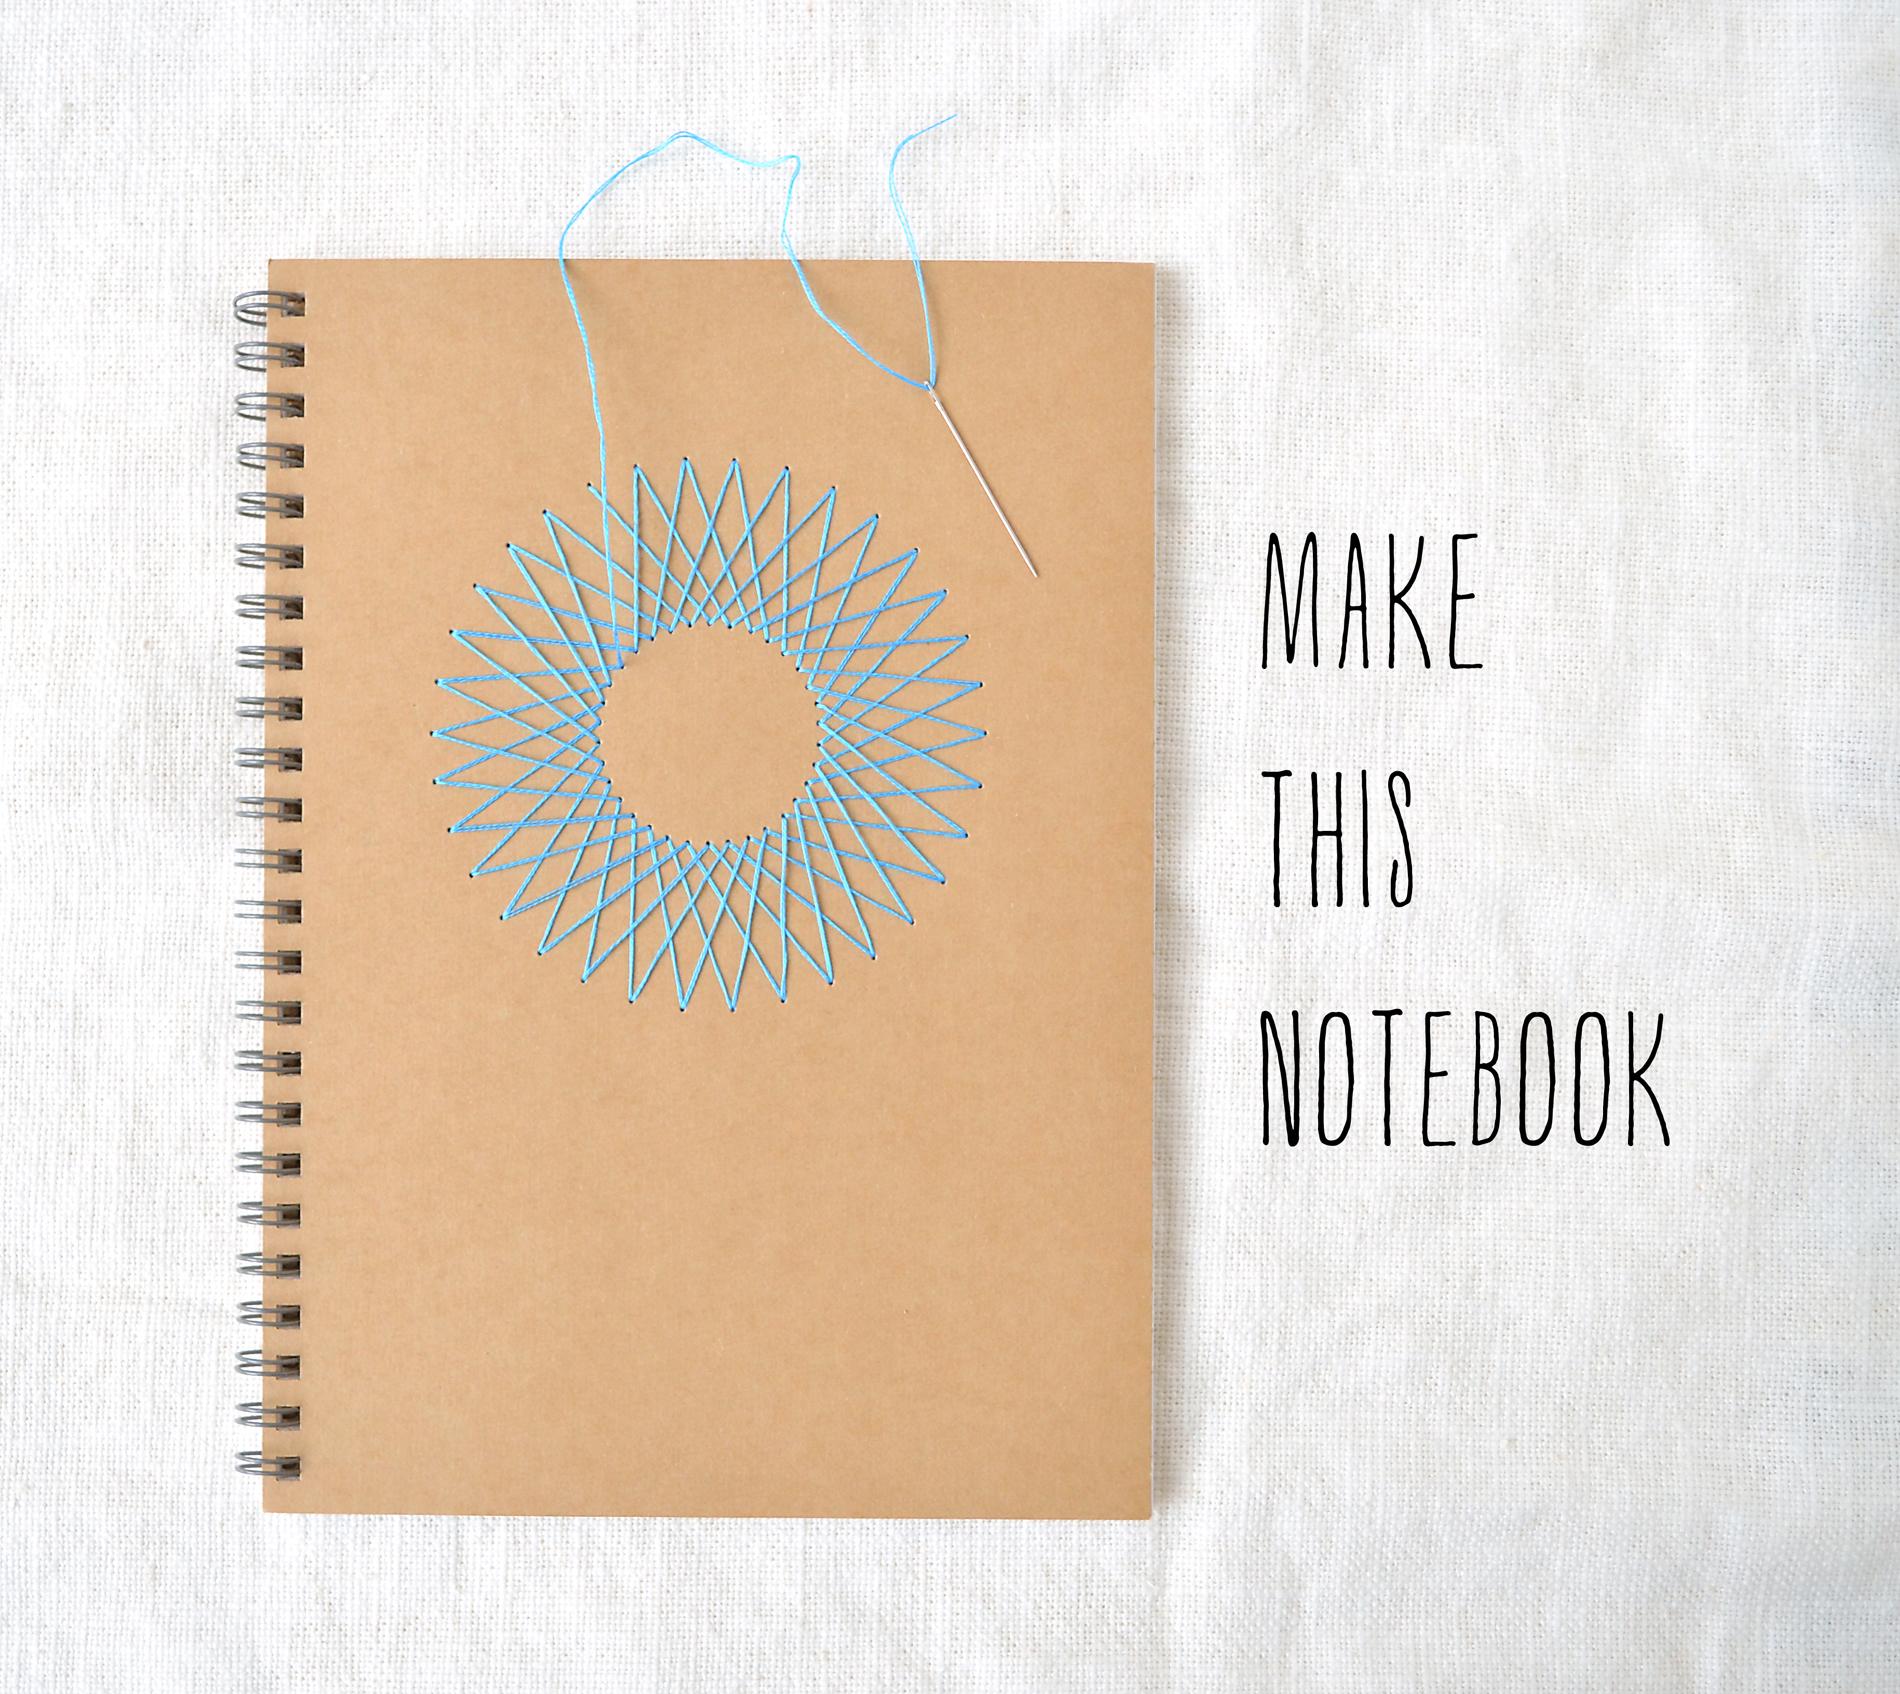 Diy kits koto diy embroidery kit this solutioingenieria Choice Image